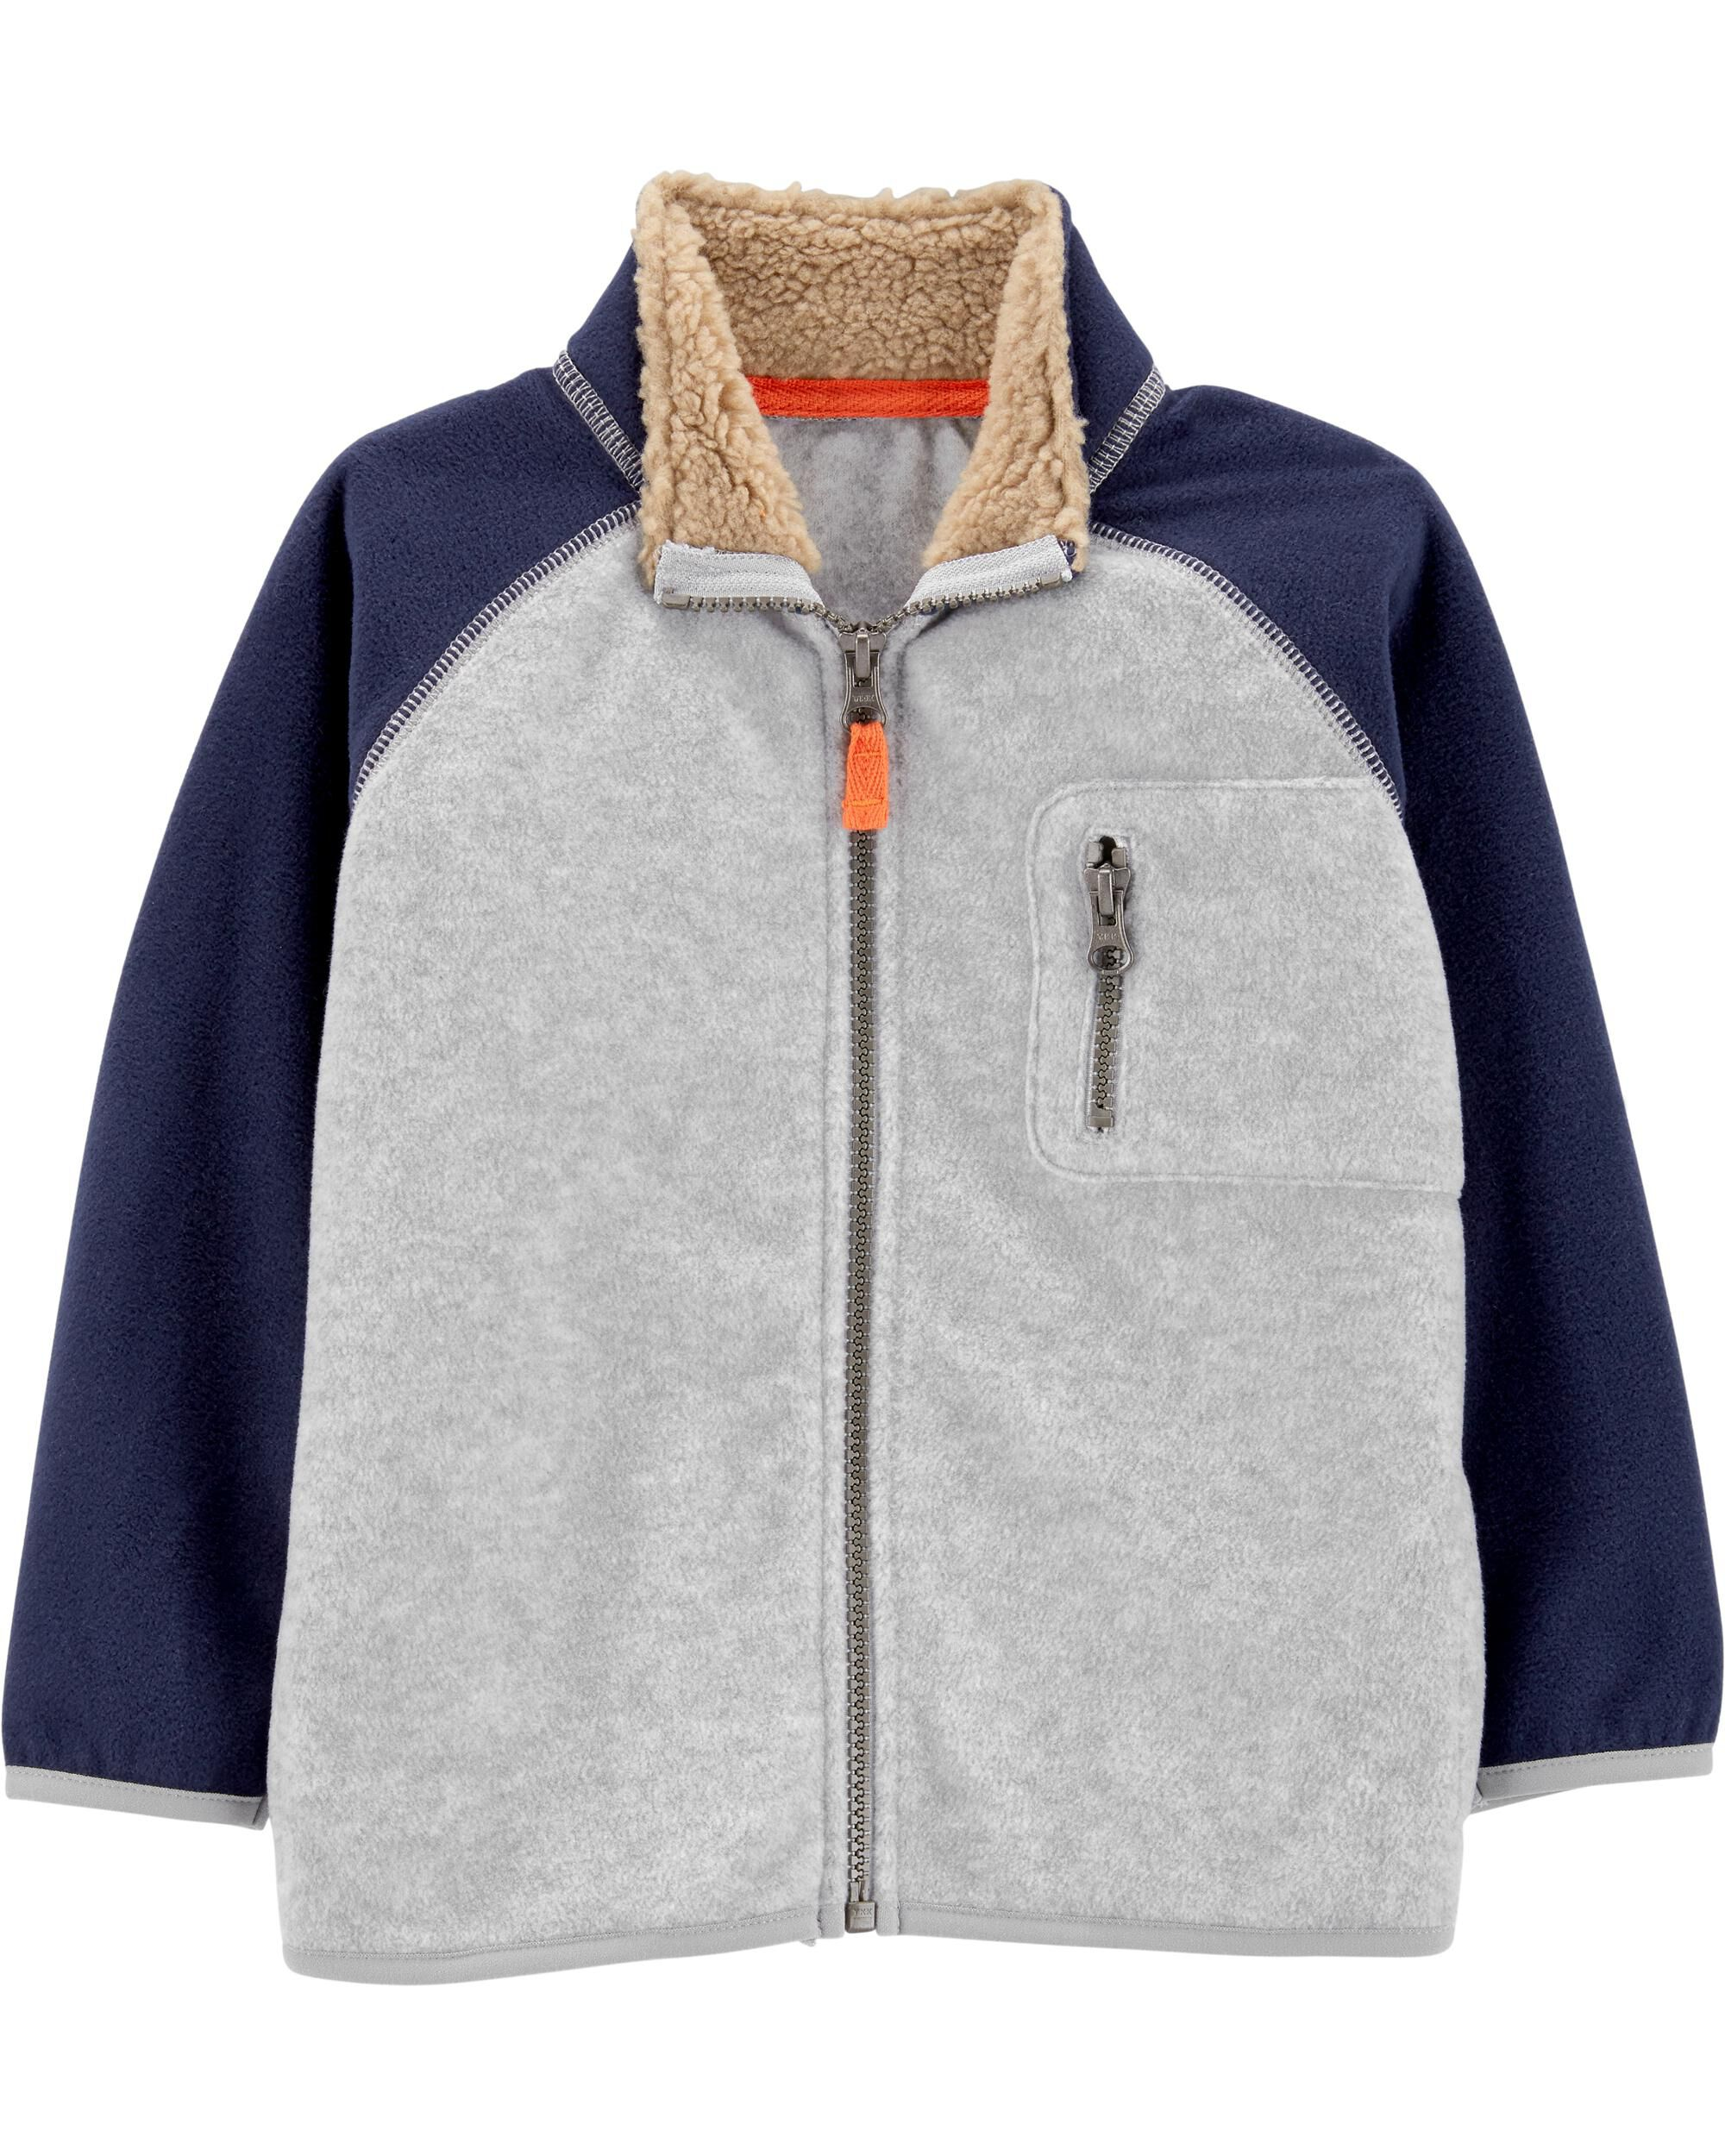 *CLEARANCE* Zip-Up Fleece Jacket